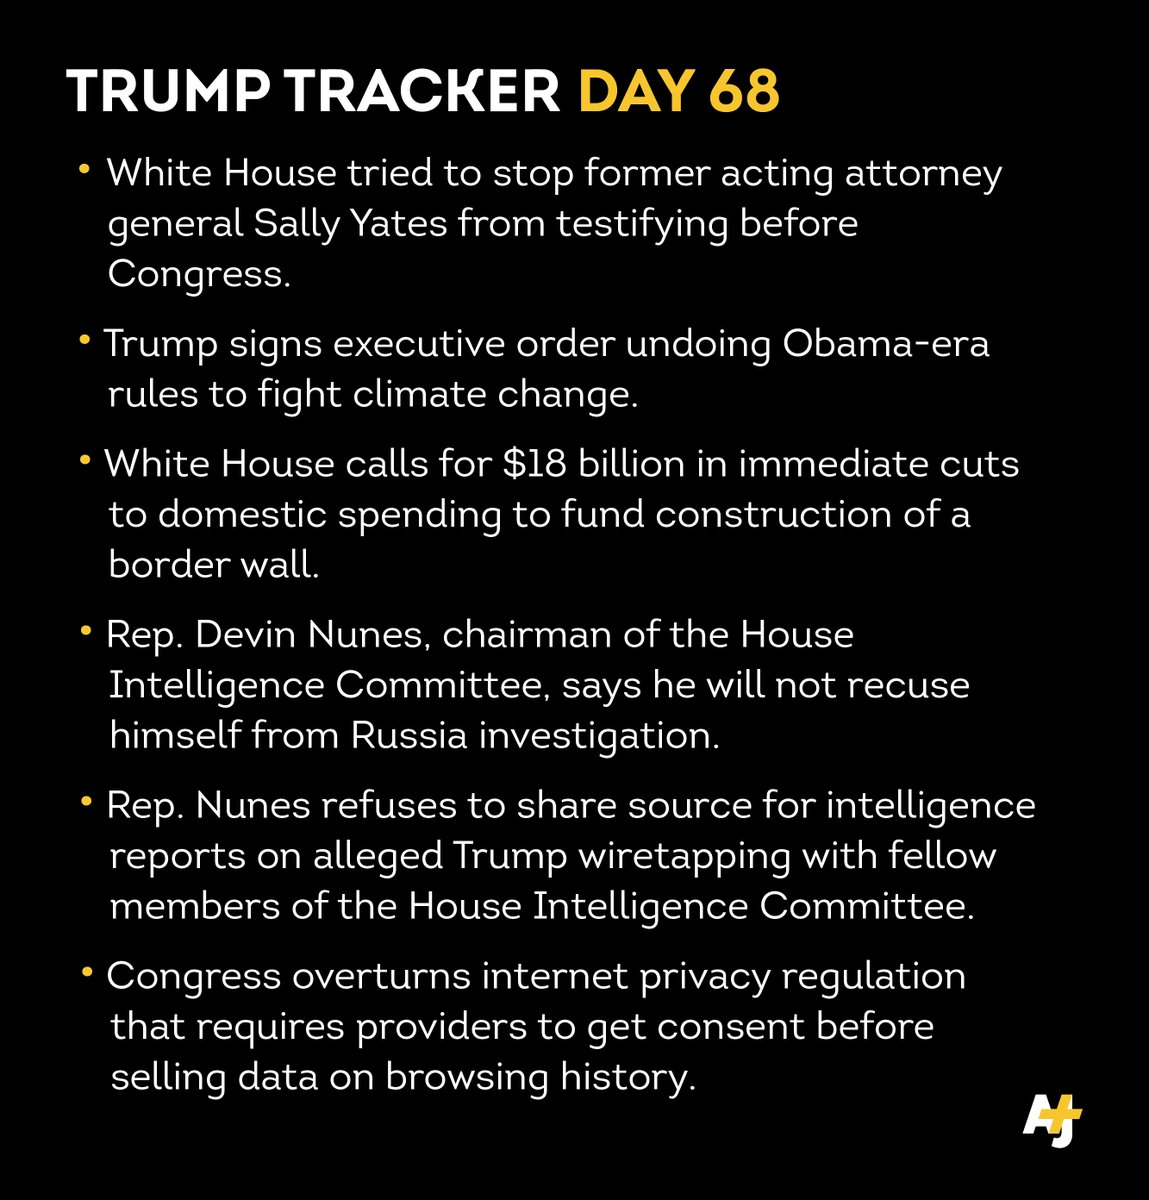 Trump Tracker, Day 68: Remember Sally Yates? https://t.co/U3EMIWhX1j